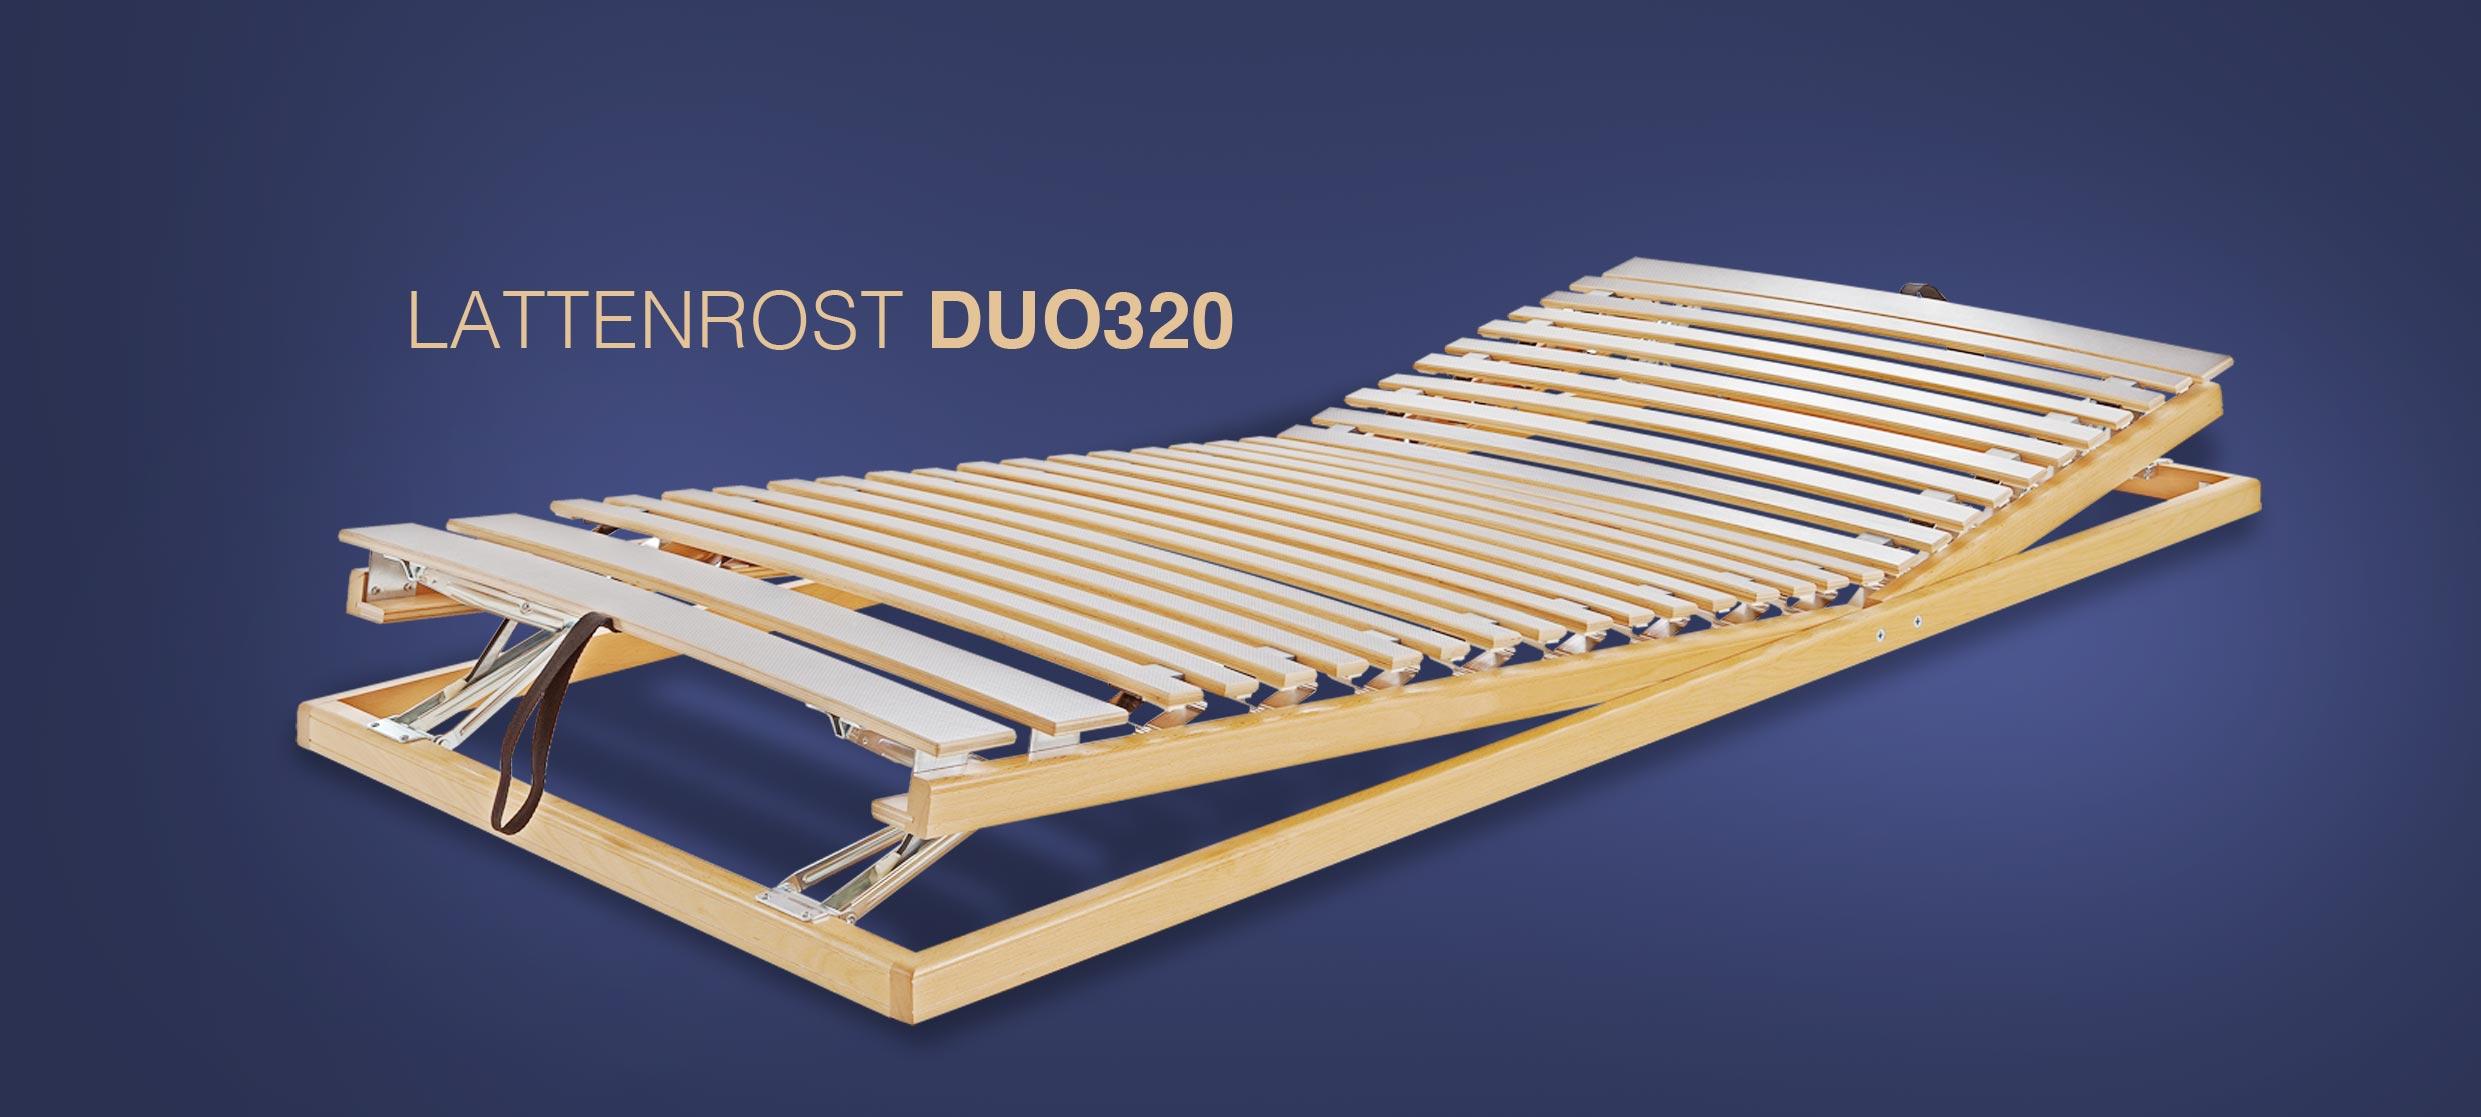 Lattenrost DUO 320